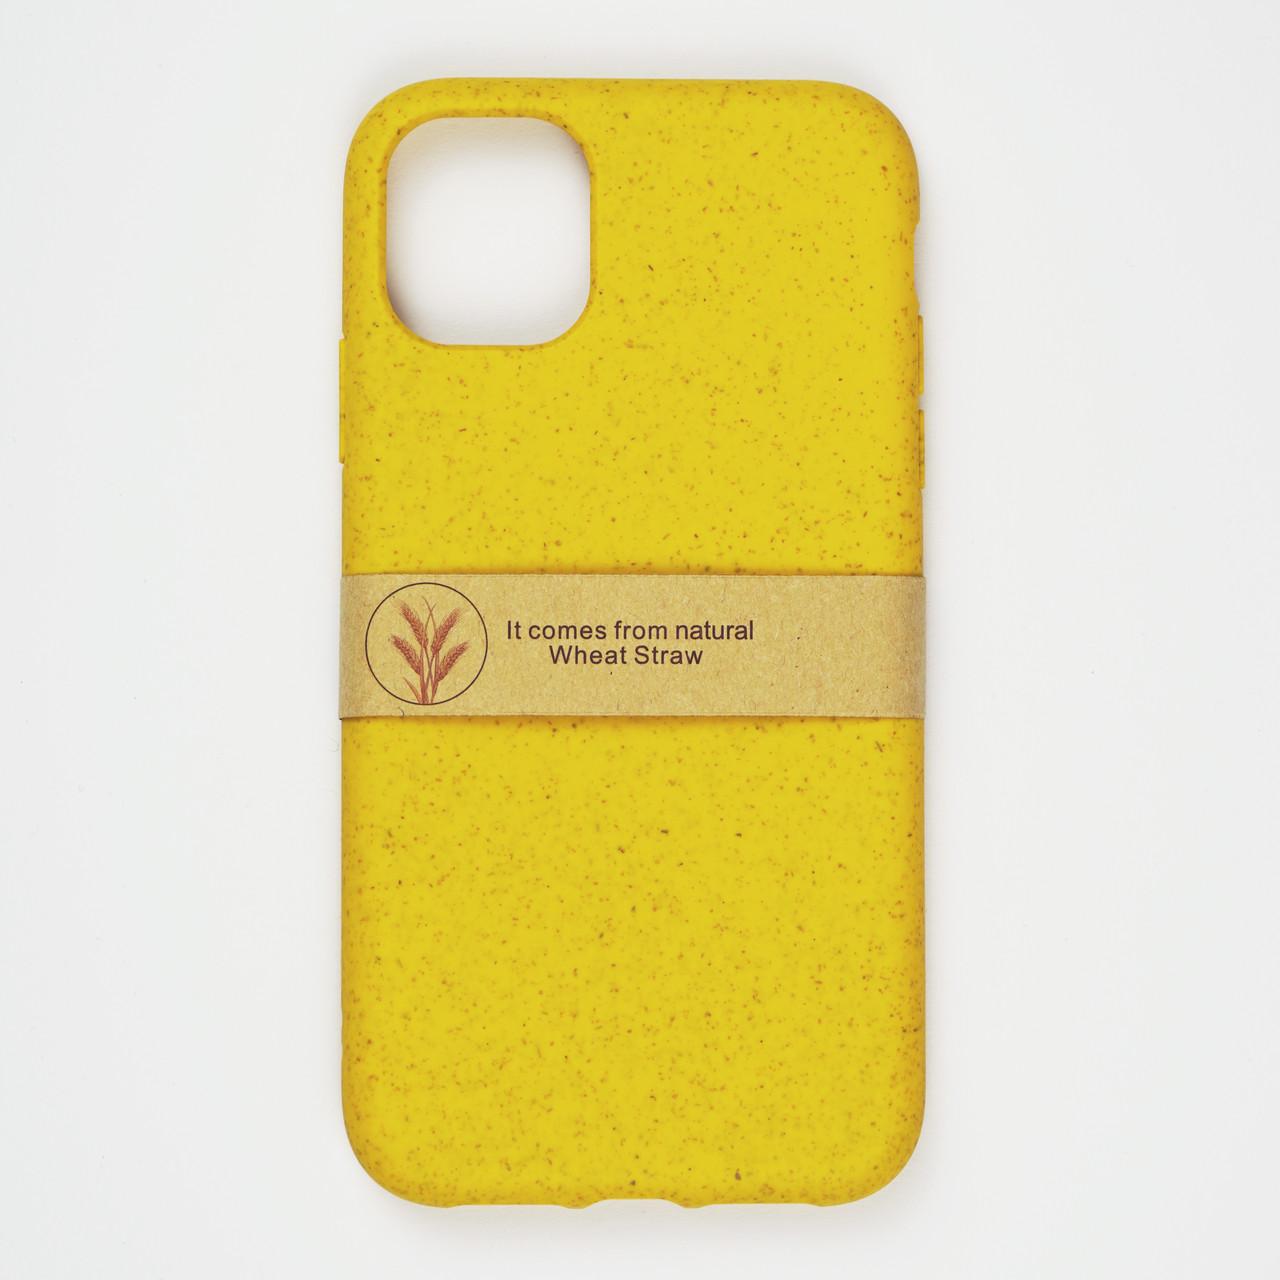 Биоразлагаемый чехол ECO Wheat Straw для iPhone 11 Pro Max Yellow